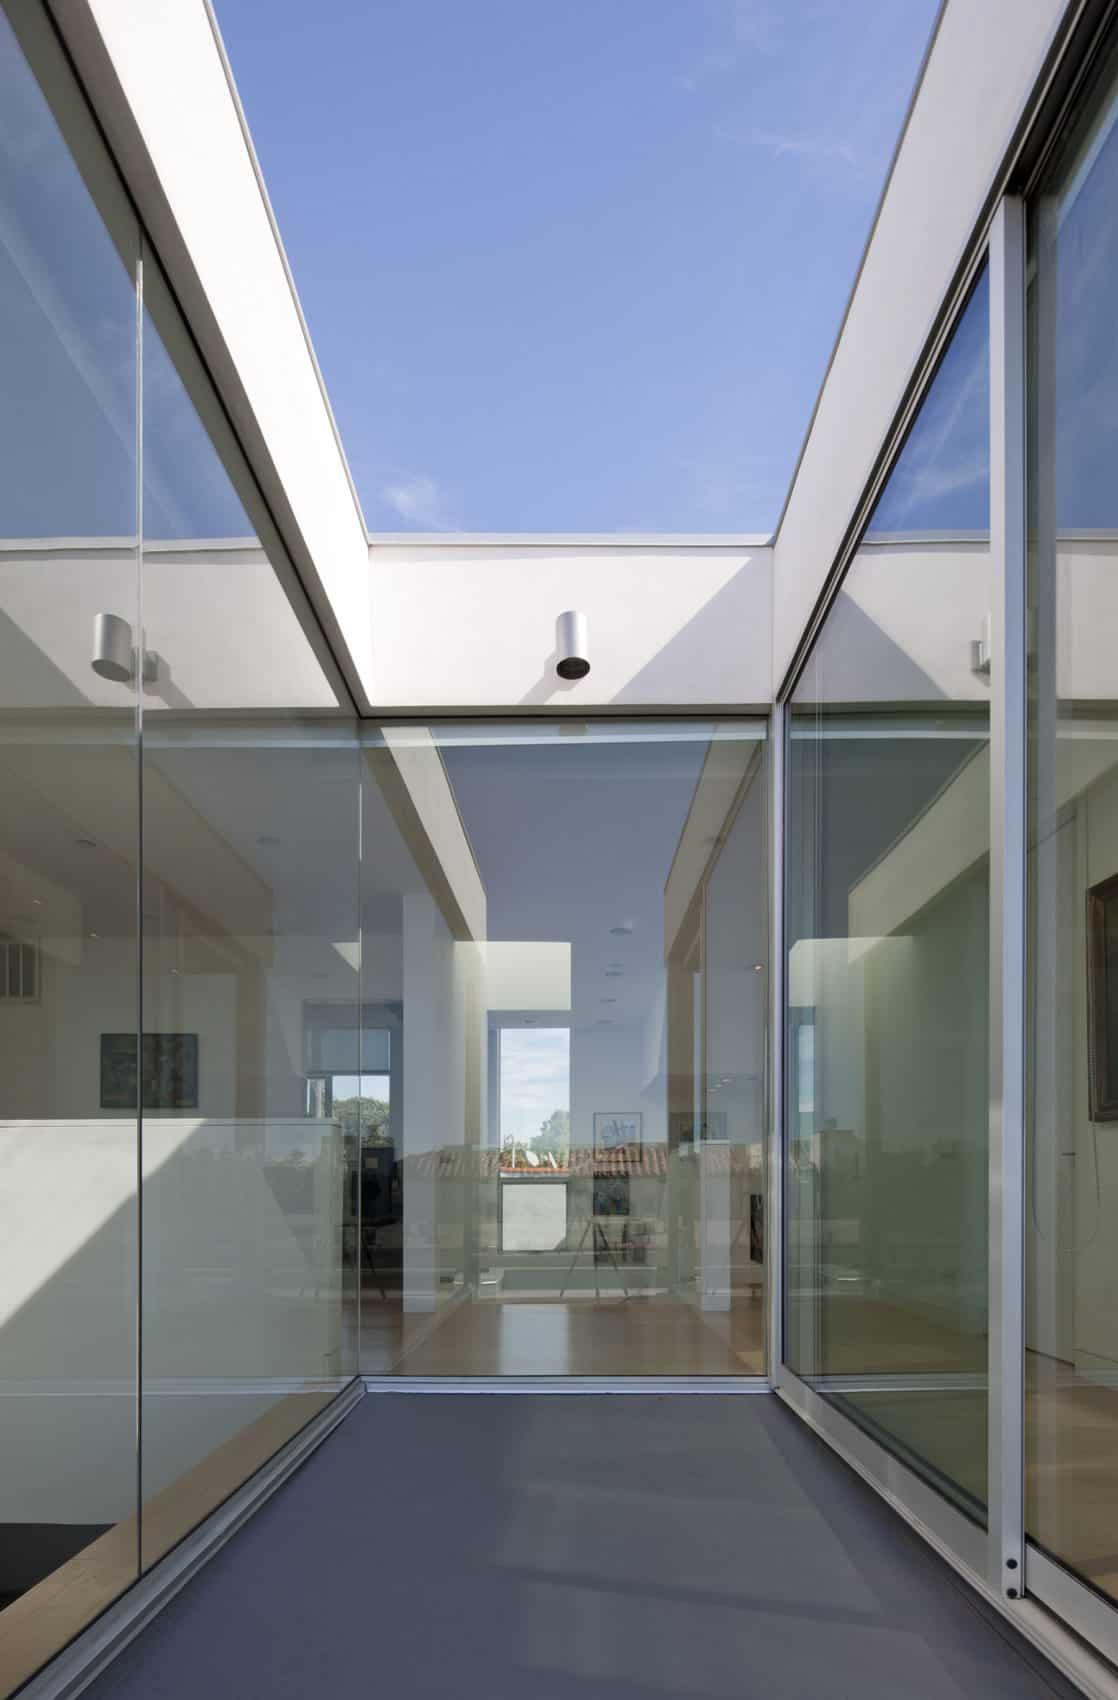 Holleb Residence by John Friedman Alice Kimm Architects (1)